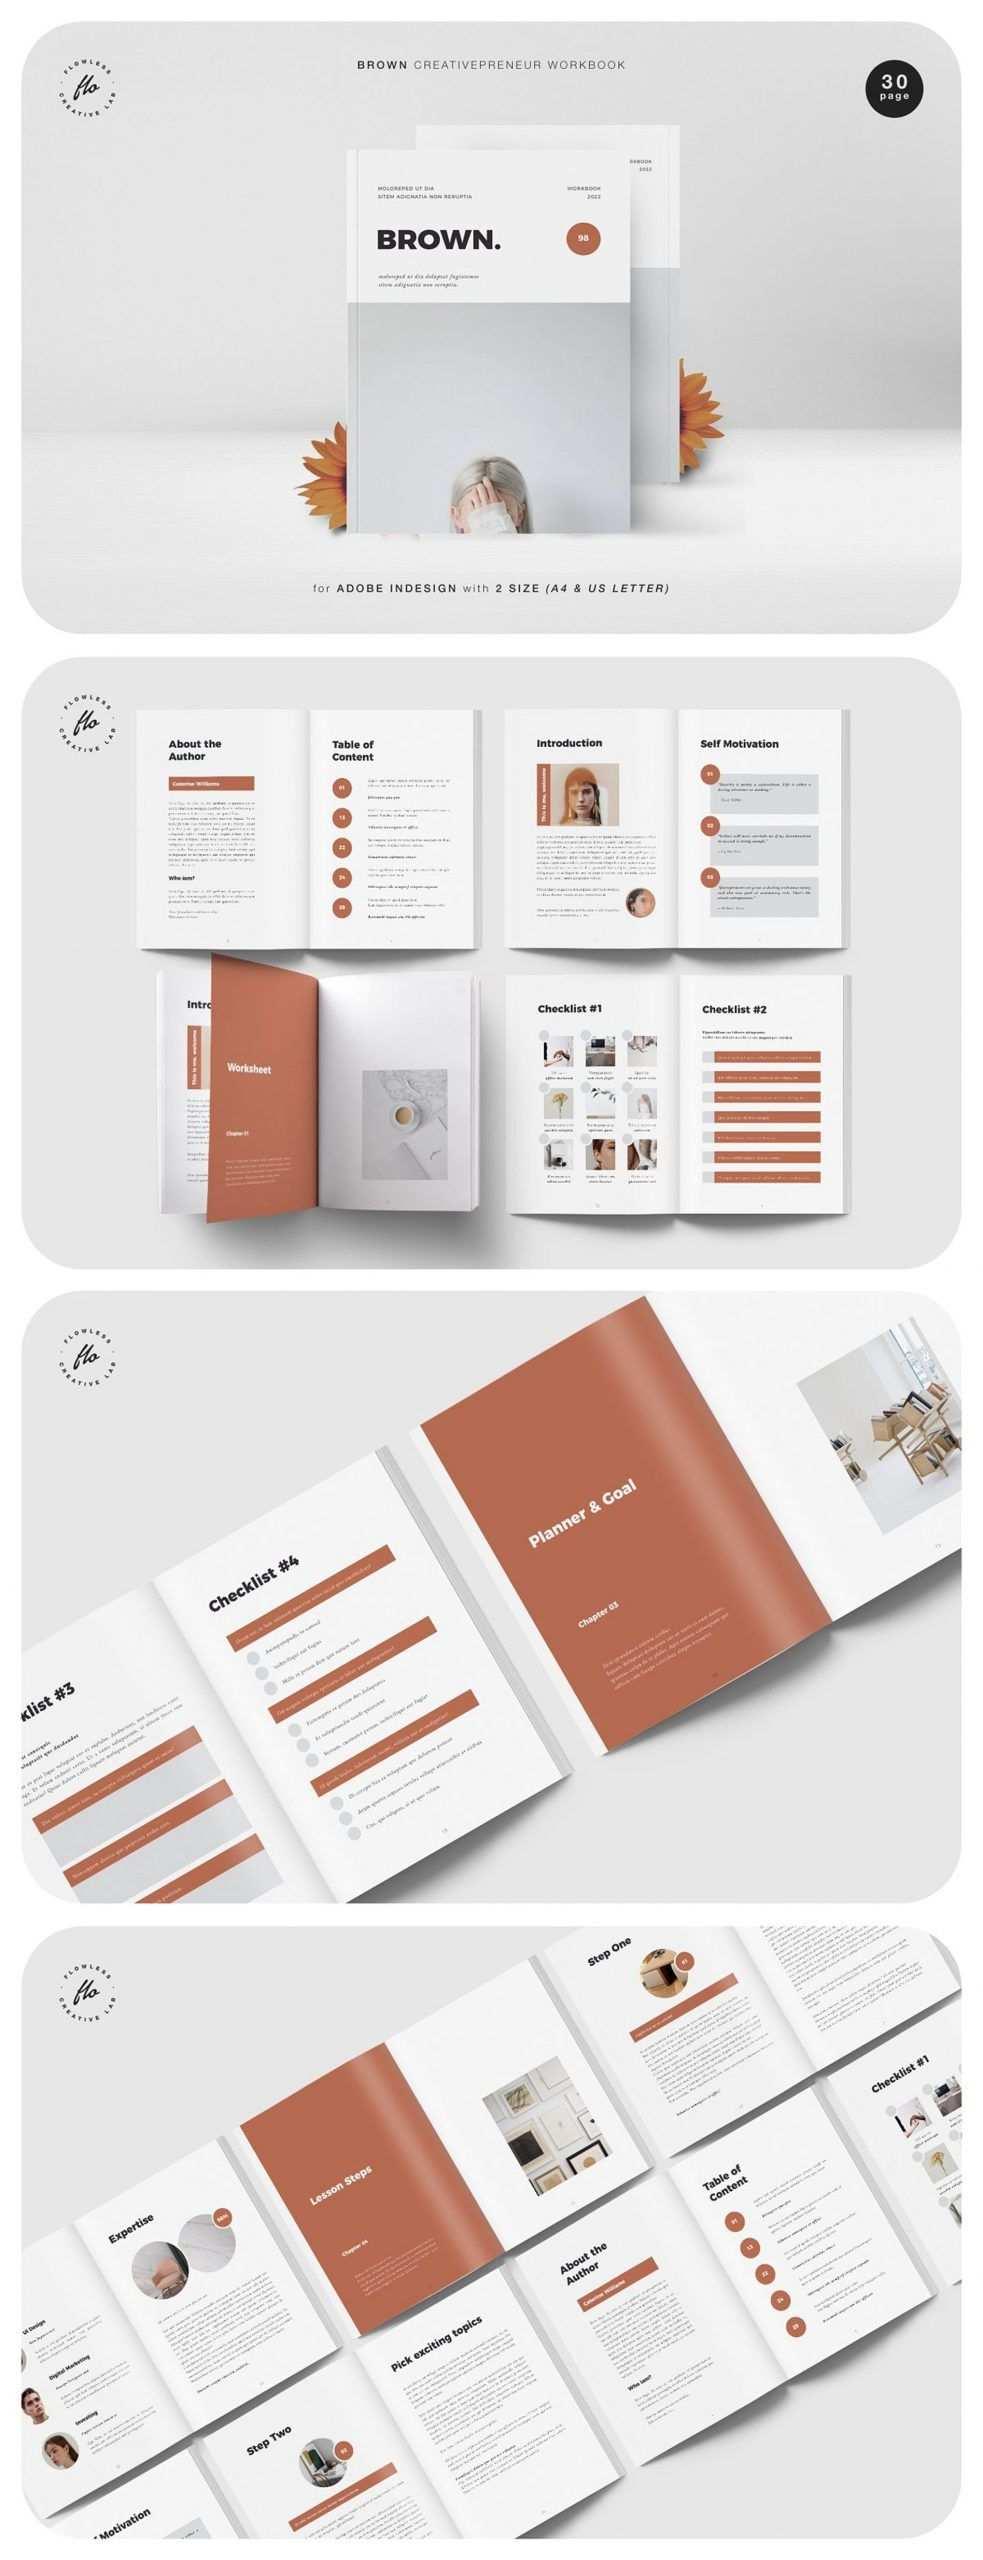 Grafikdesign Minimalistischer Katalog Lookbook Vorlagen Broschuren Design Vorlagen Magazin Layouts En 2020 Brochure Creativos Agencia De Publicidad Diseno Editorial